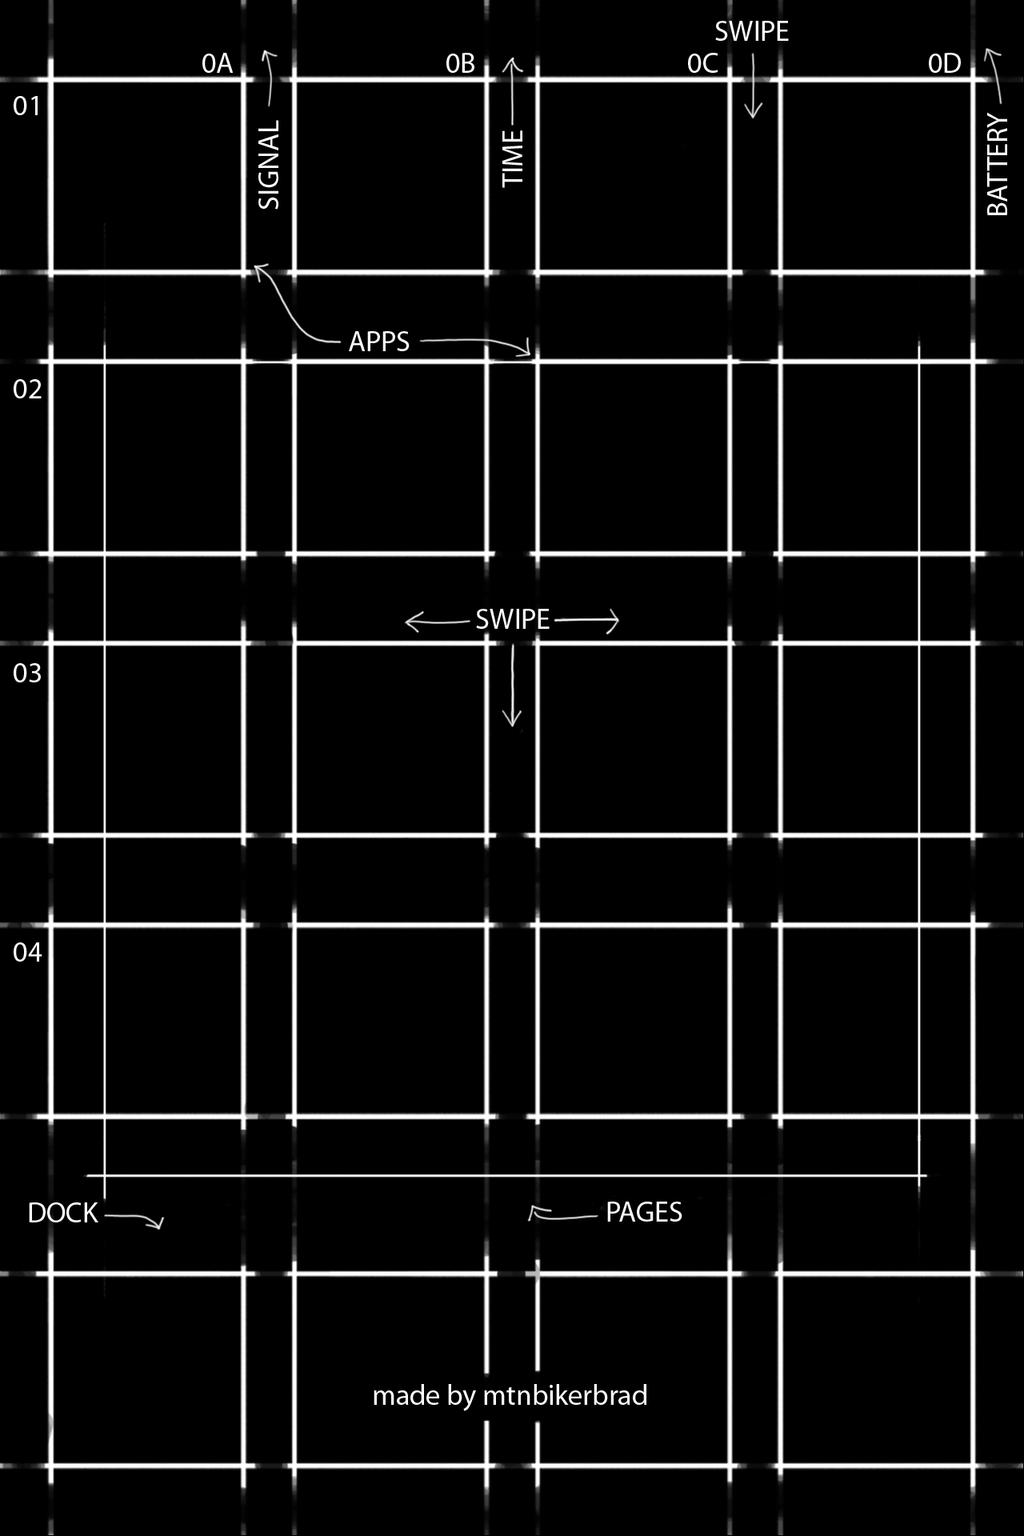 Blackprint flat ios7 wallpaper by mtnbikerbrad on deviantart blackprint flat ios7 wallpaper by mtnbikerbrad blackprint flat ios7 wallpaper by mtnbikerbrad malvernweather Image collections